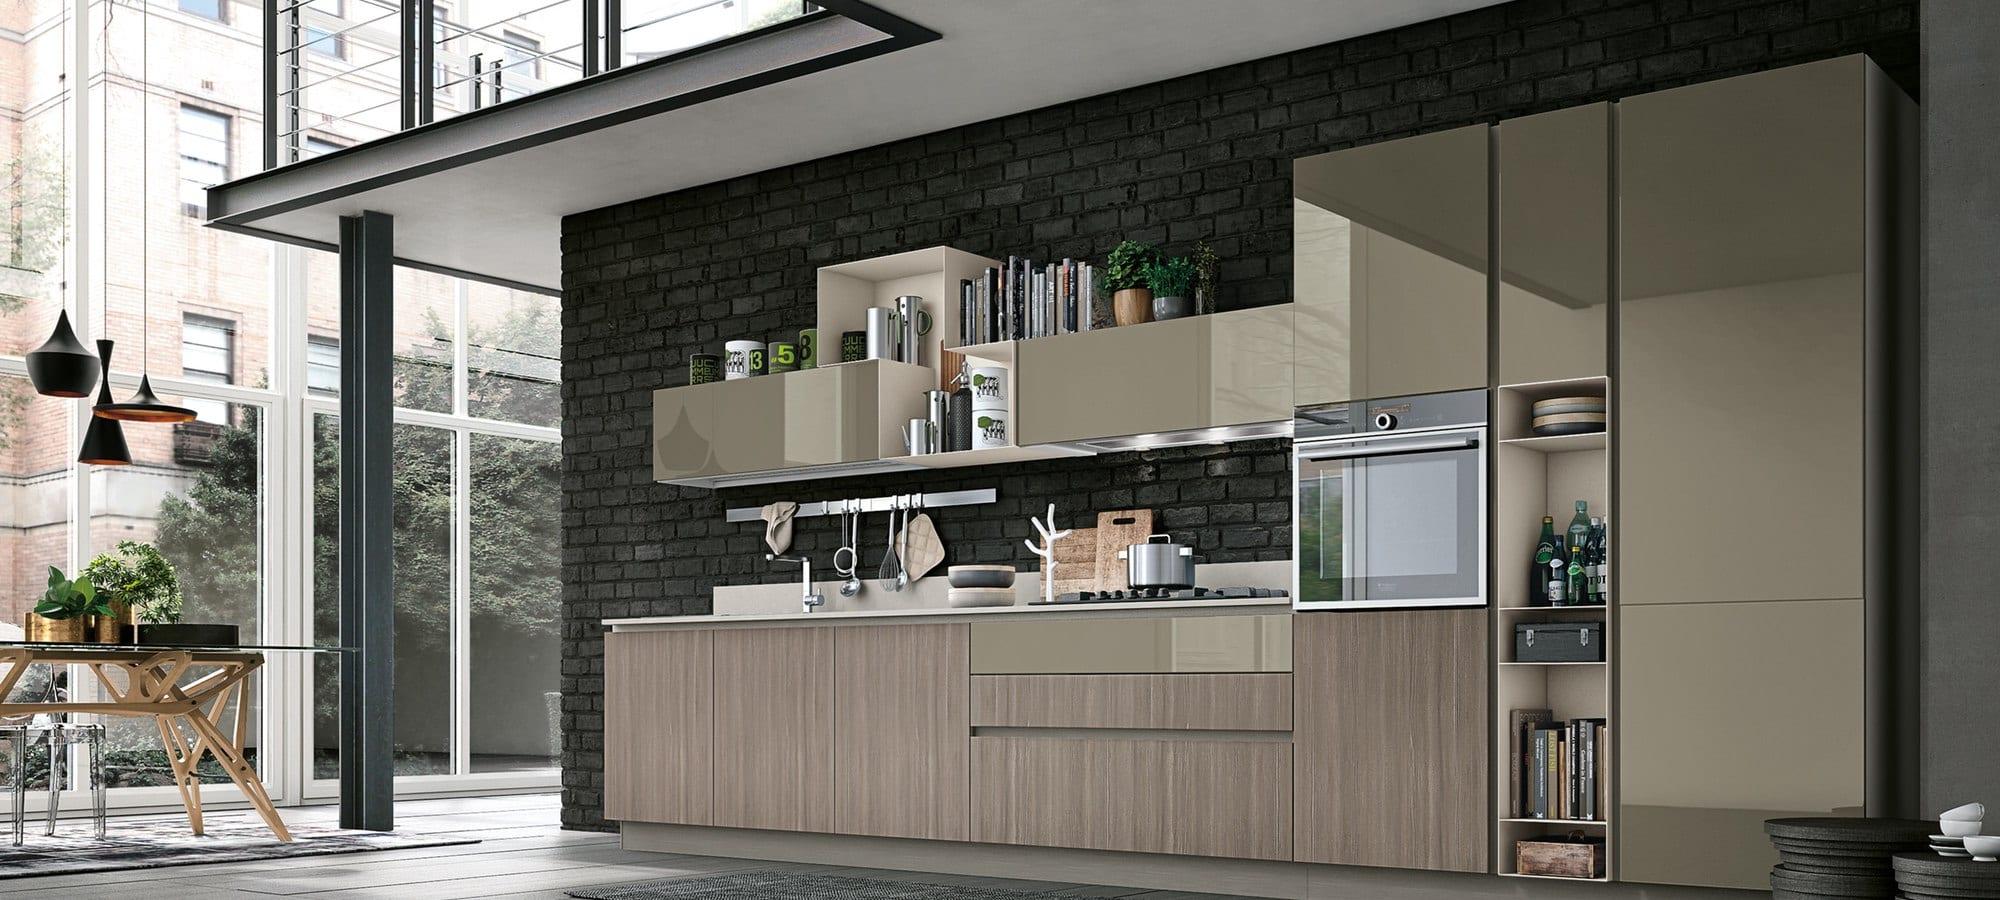 Stosa Cucine Moderne - Design Per La Casa Moderna - Ltay.net